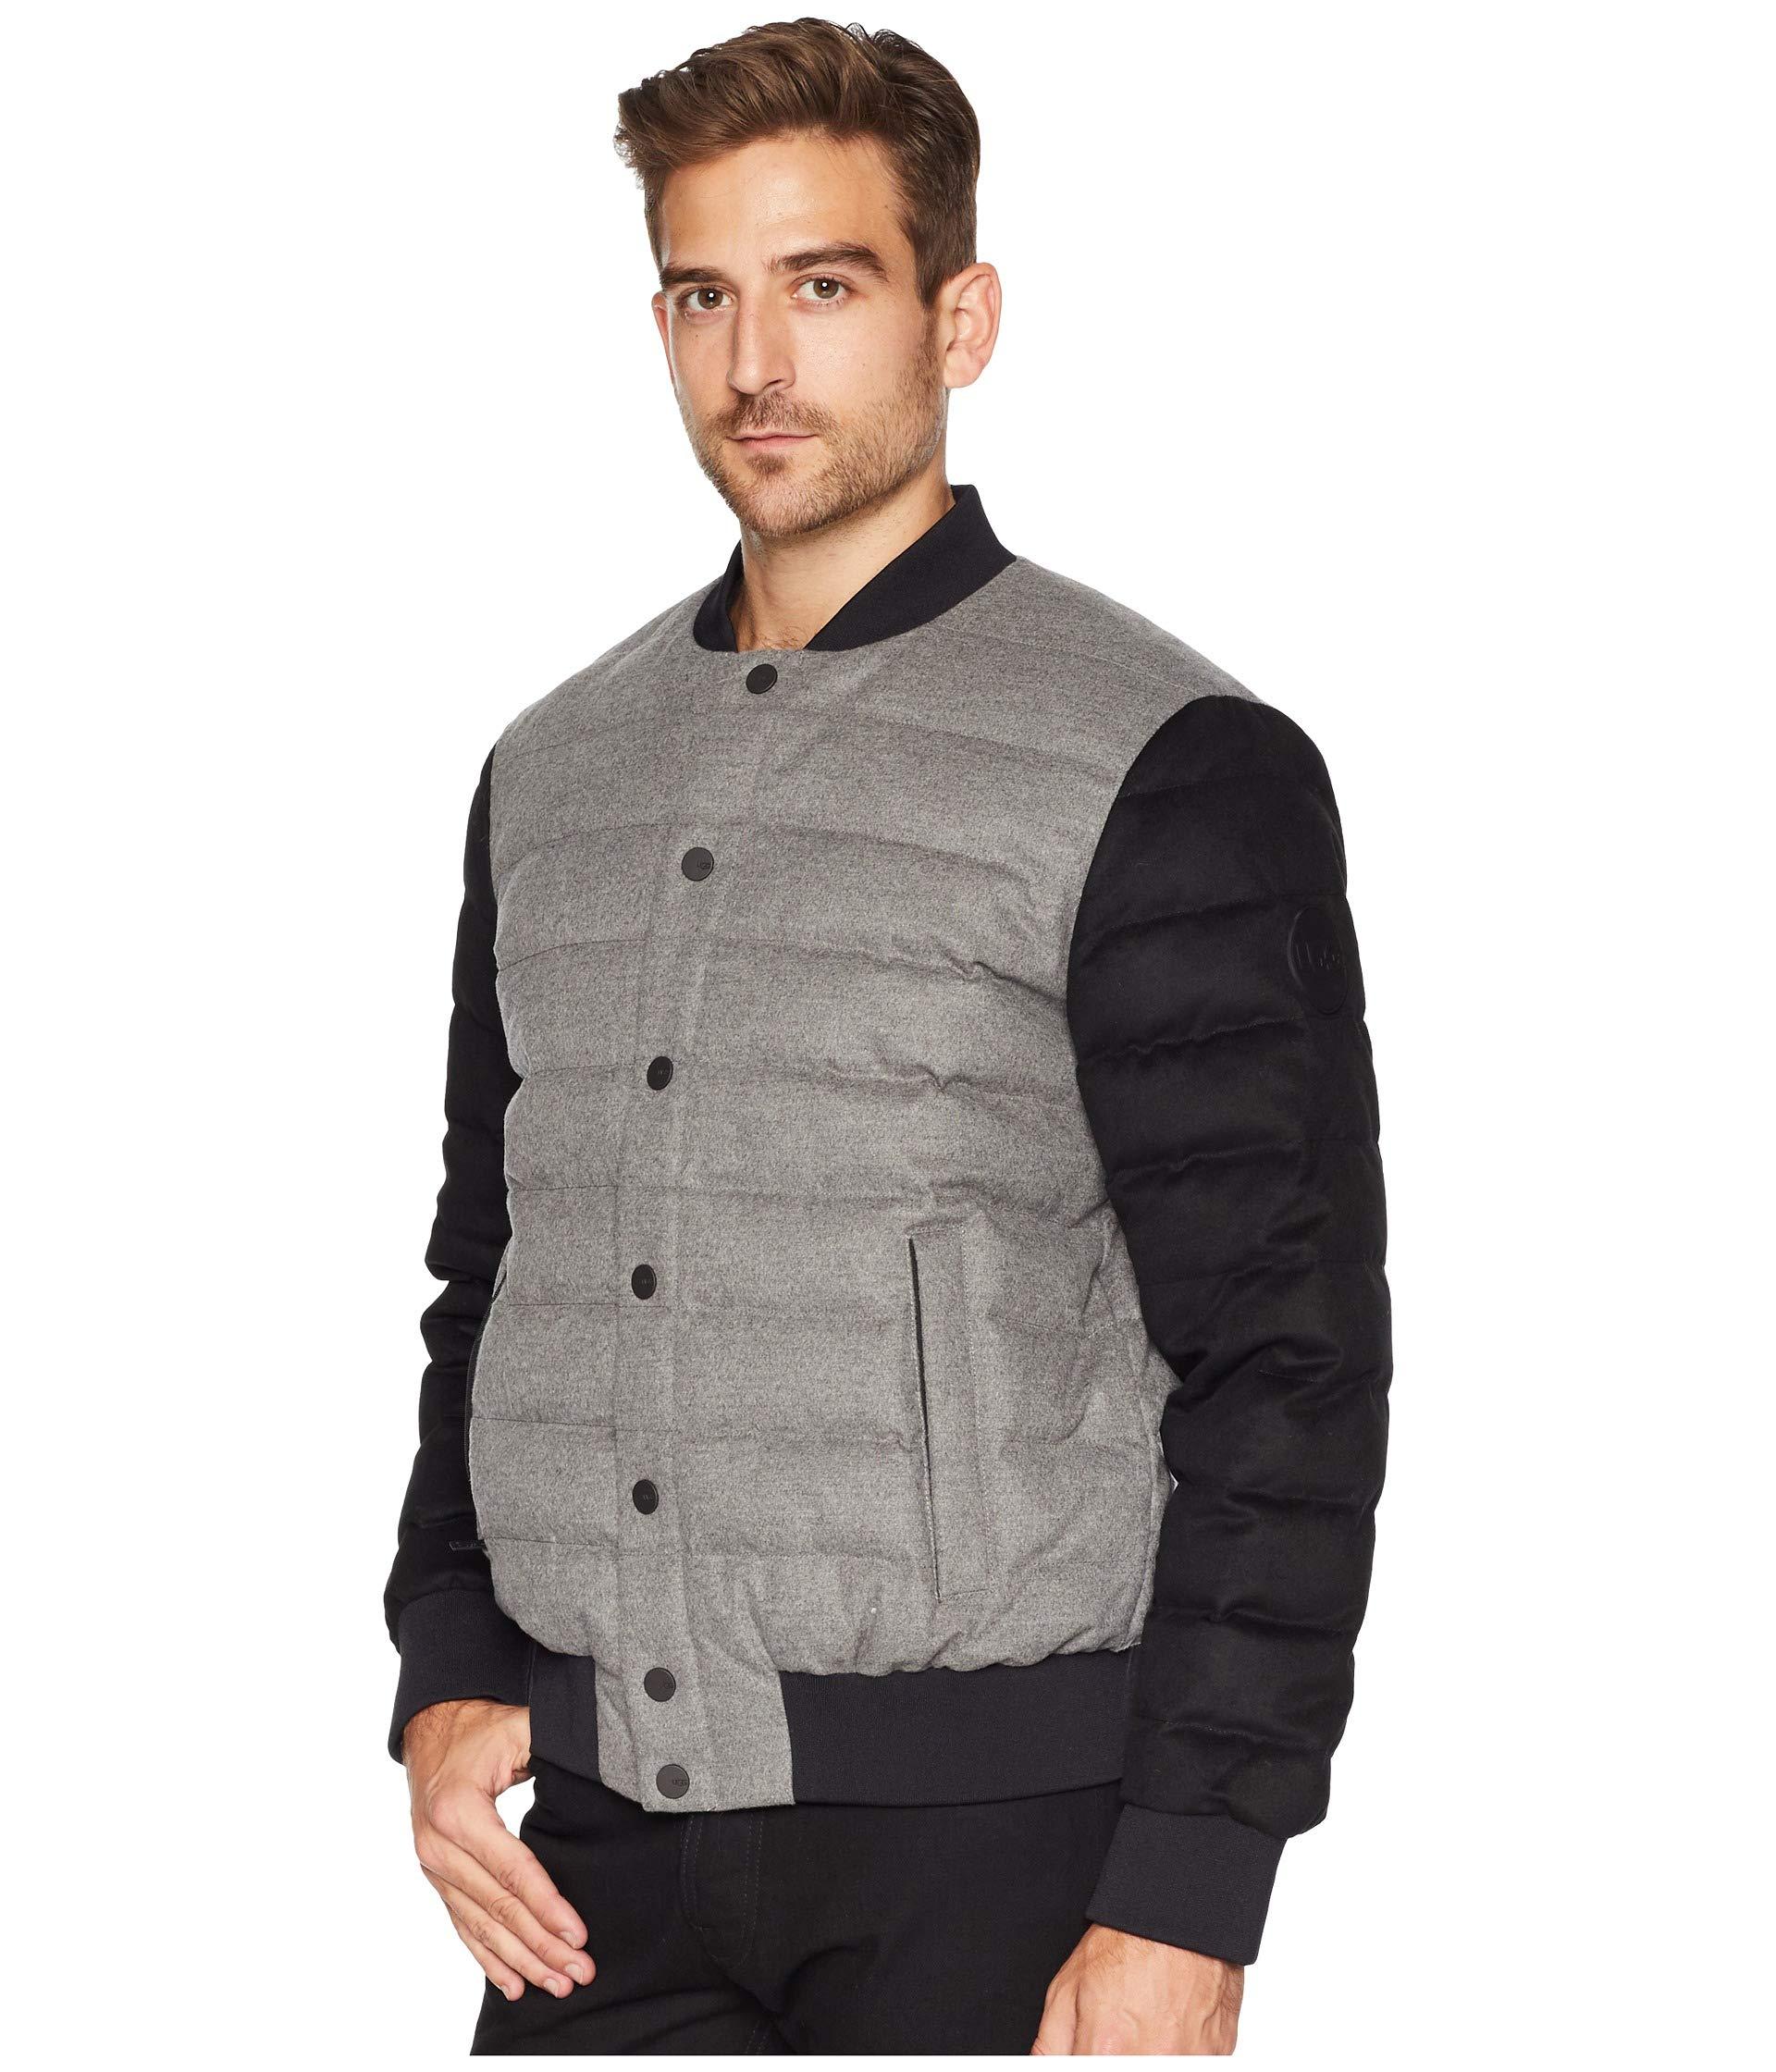 Medium Gavin Grey Jacket black Wool Bomber Ugg Heather qpxZfOw